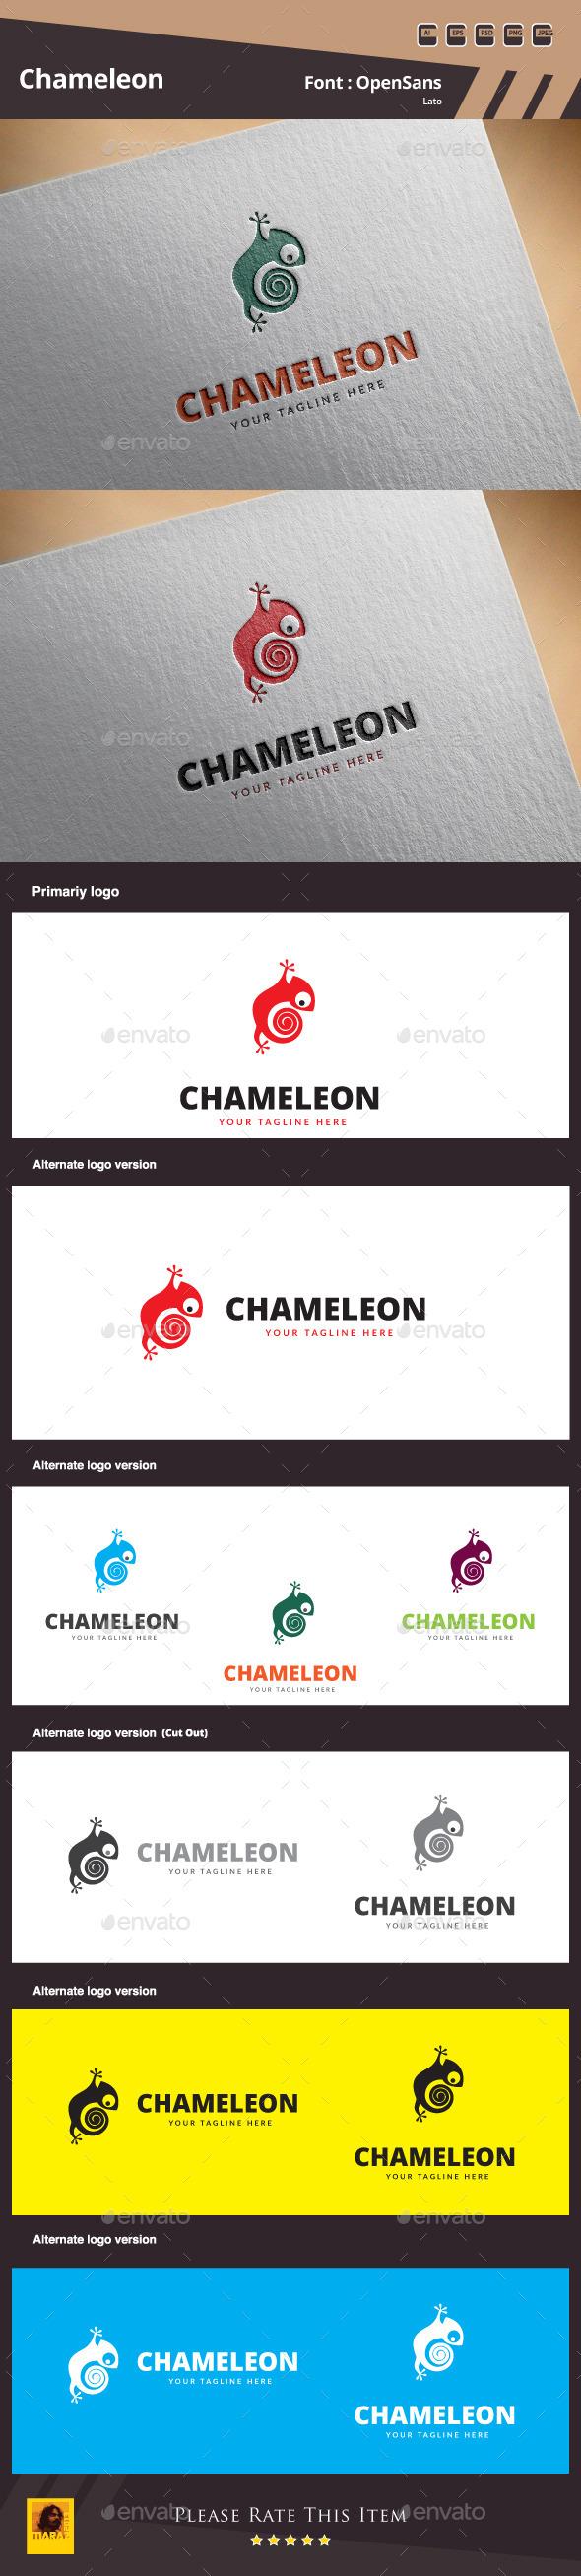 GraphicRiver Chameleon Logo Template 11547489